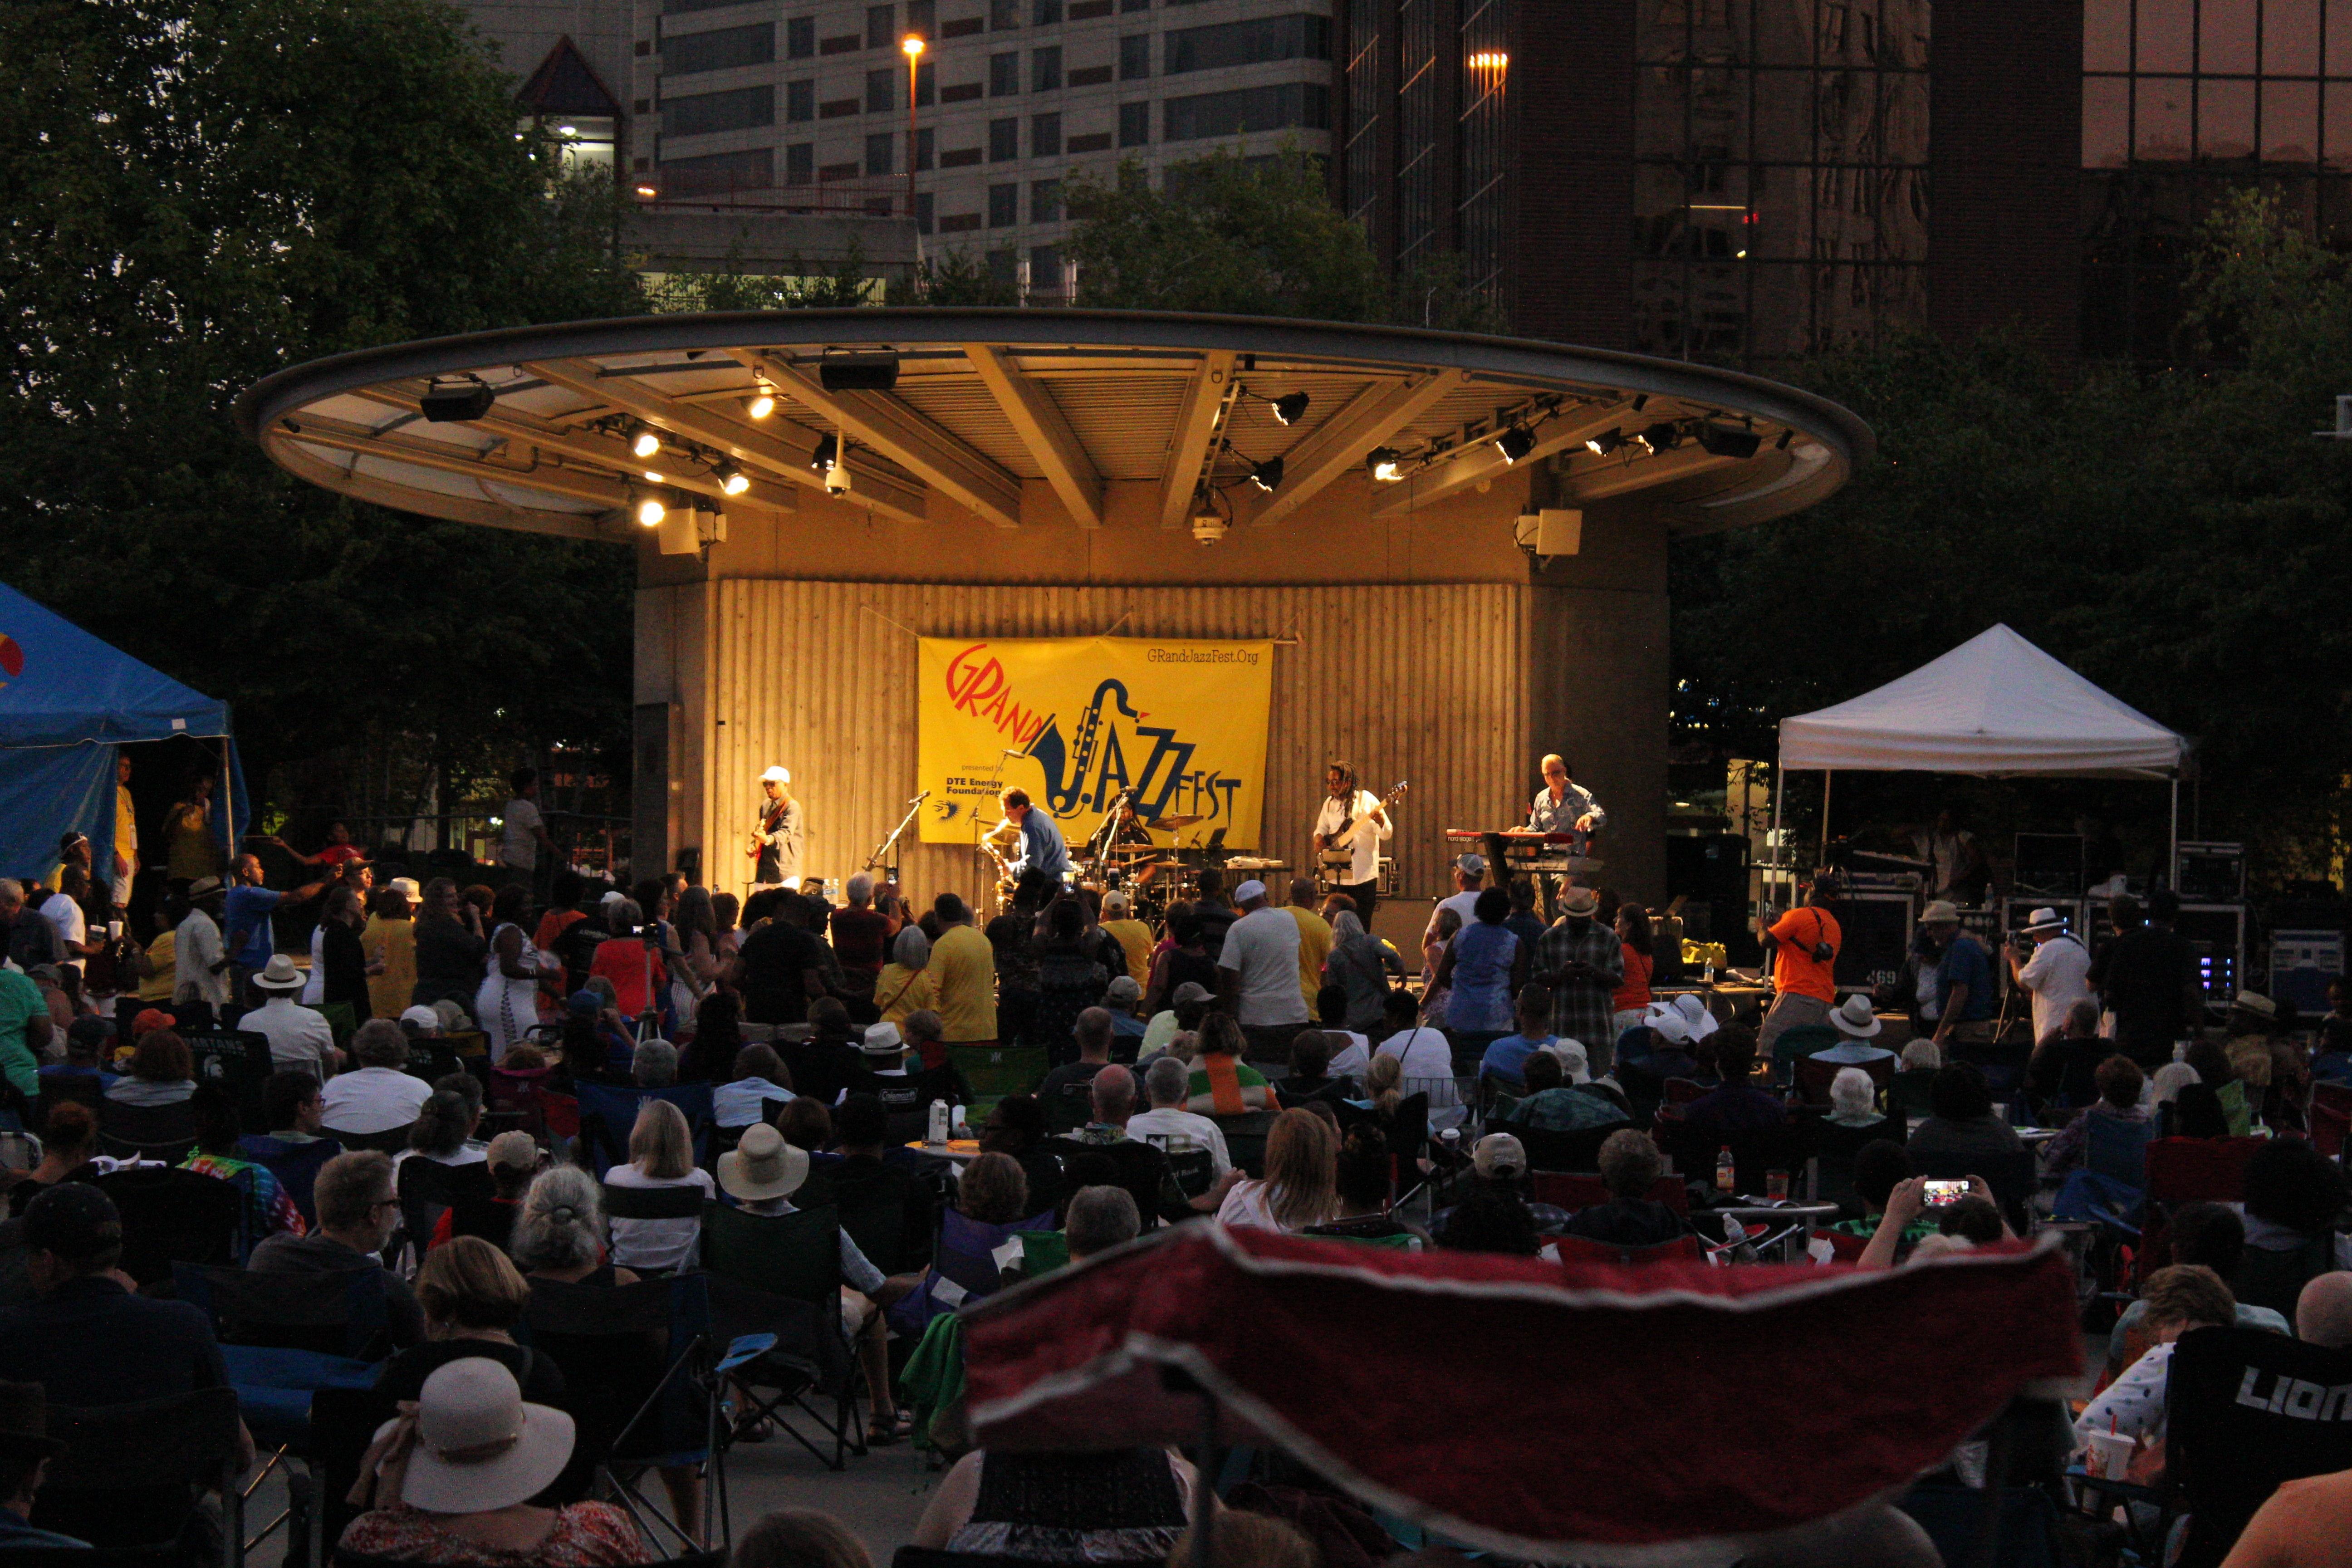 Euge Groove, Lin Roundtree To Heat Up 2018 GRandJazzFest